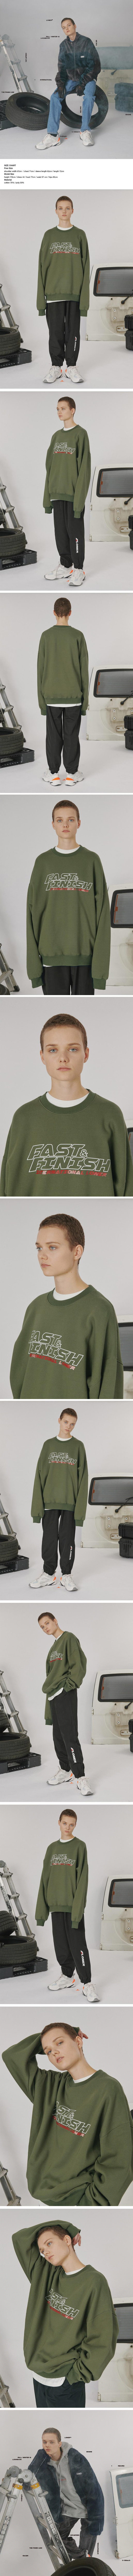 Fast and finish sweatshirt_khaki.jpg